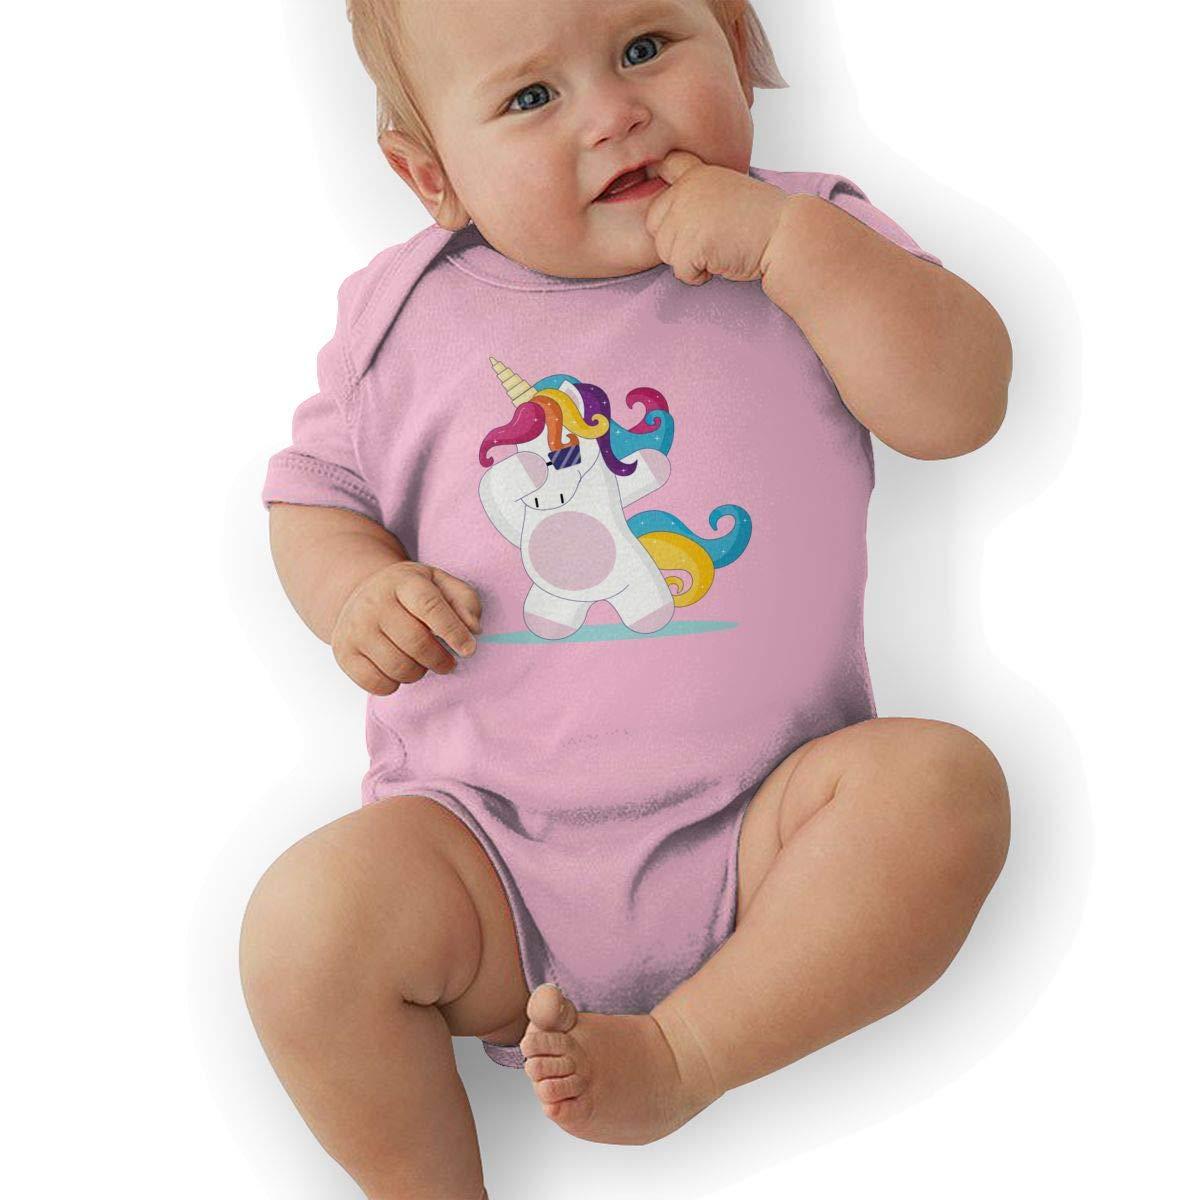 Cute Dancing Unicorn Baby Boys Girls Jumpsuits Short Sleeve Romper Bodysuit Bodysuit Jumpsuit Outfits Pink